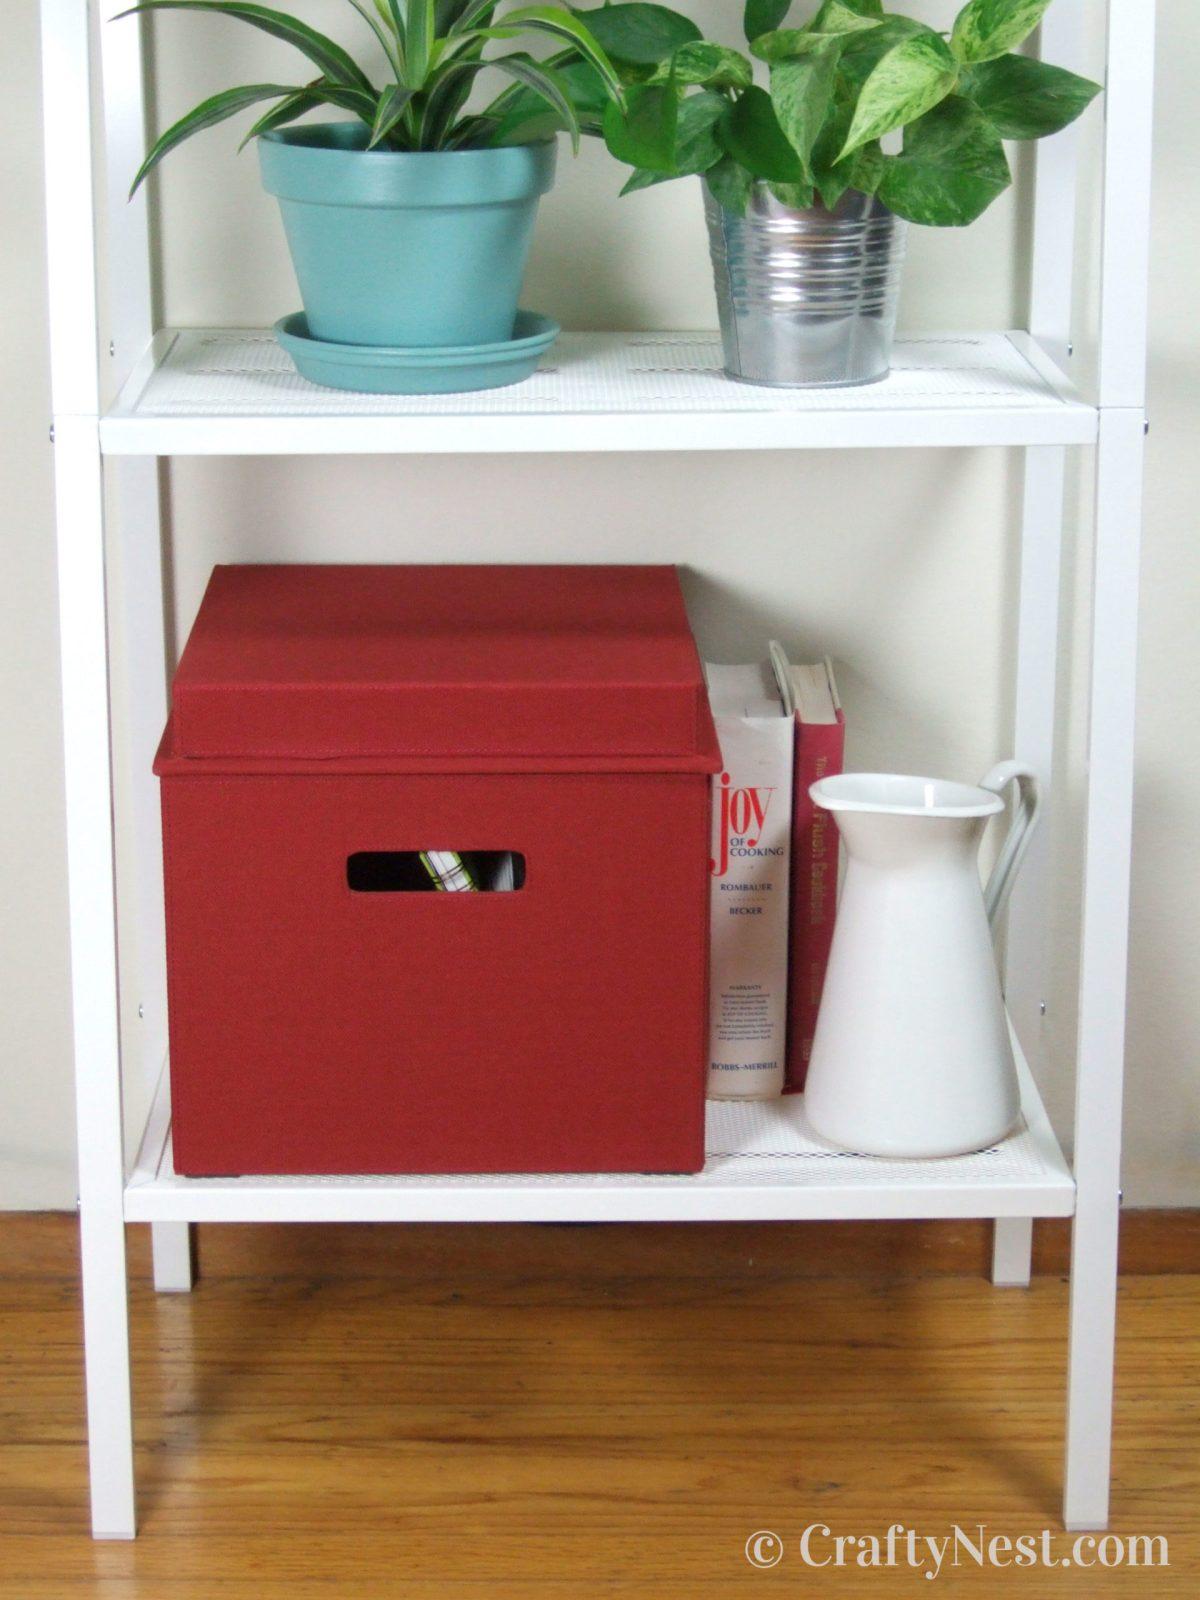 Closed Bento Box on a shelf, photo